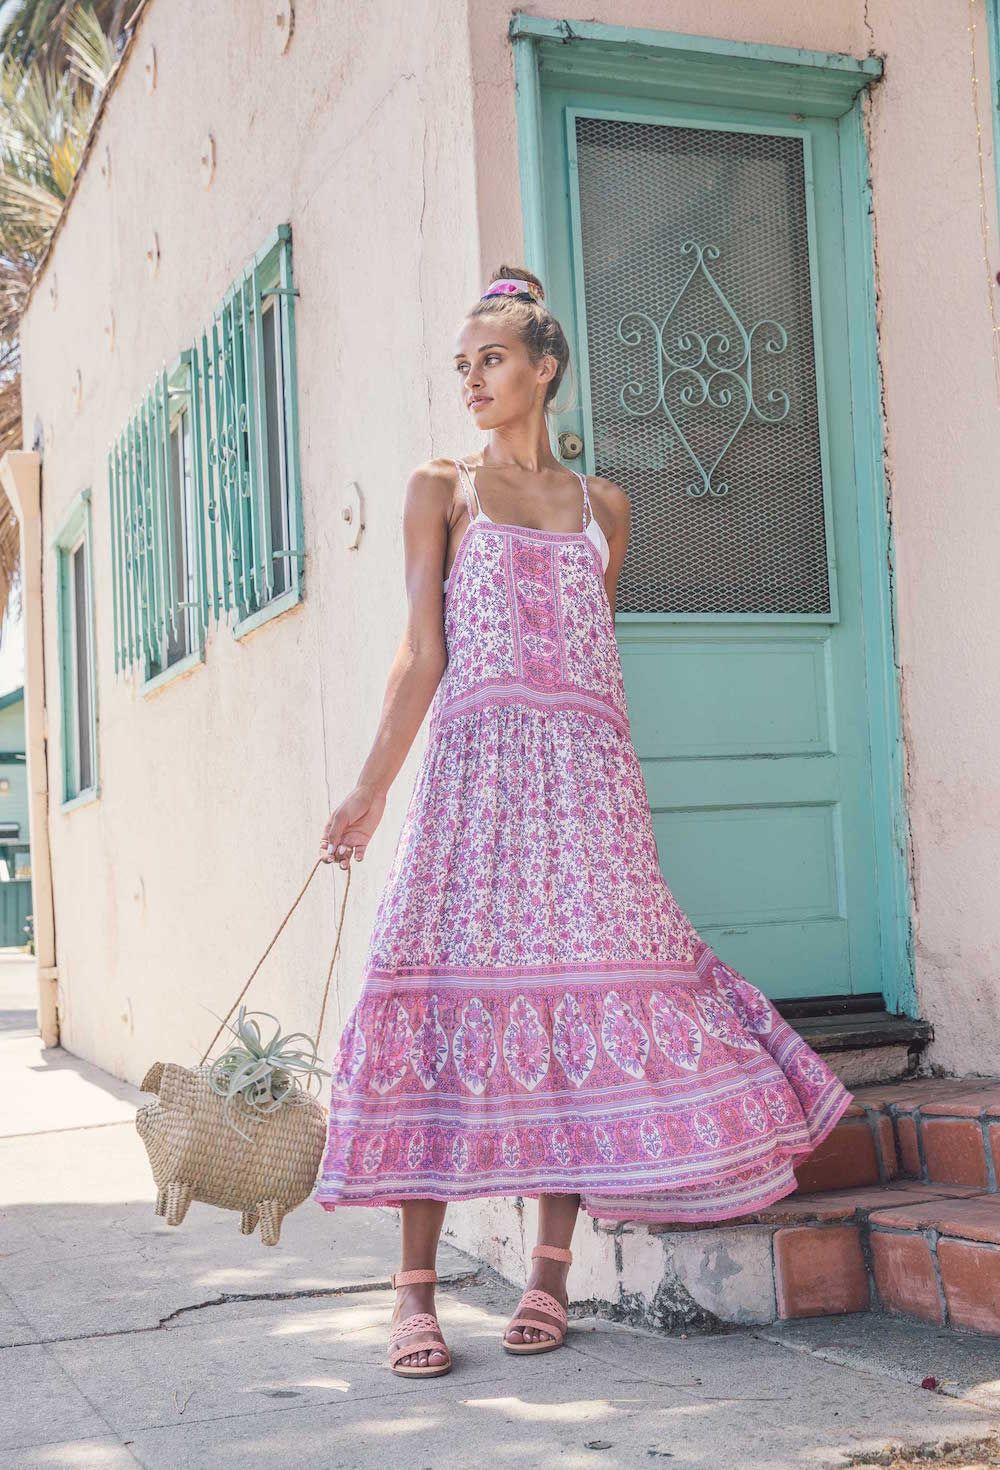 Bared_Footwear_Womens_Pink_Linnet_Sandals_Pink_Dress_LA_Summer